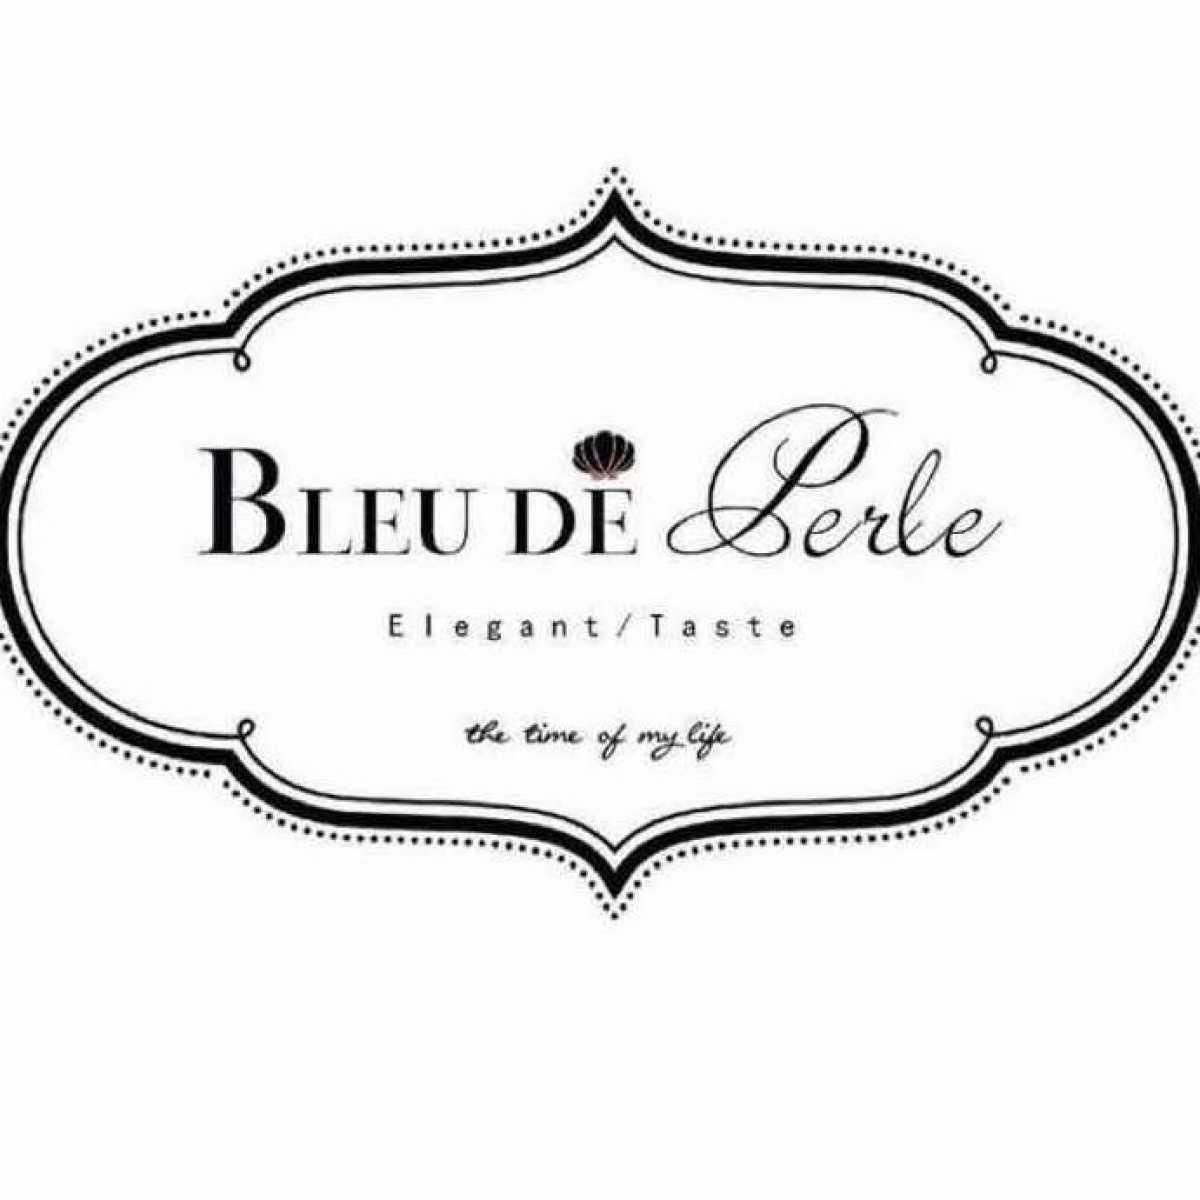 Blue De Perle